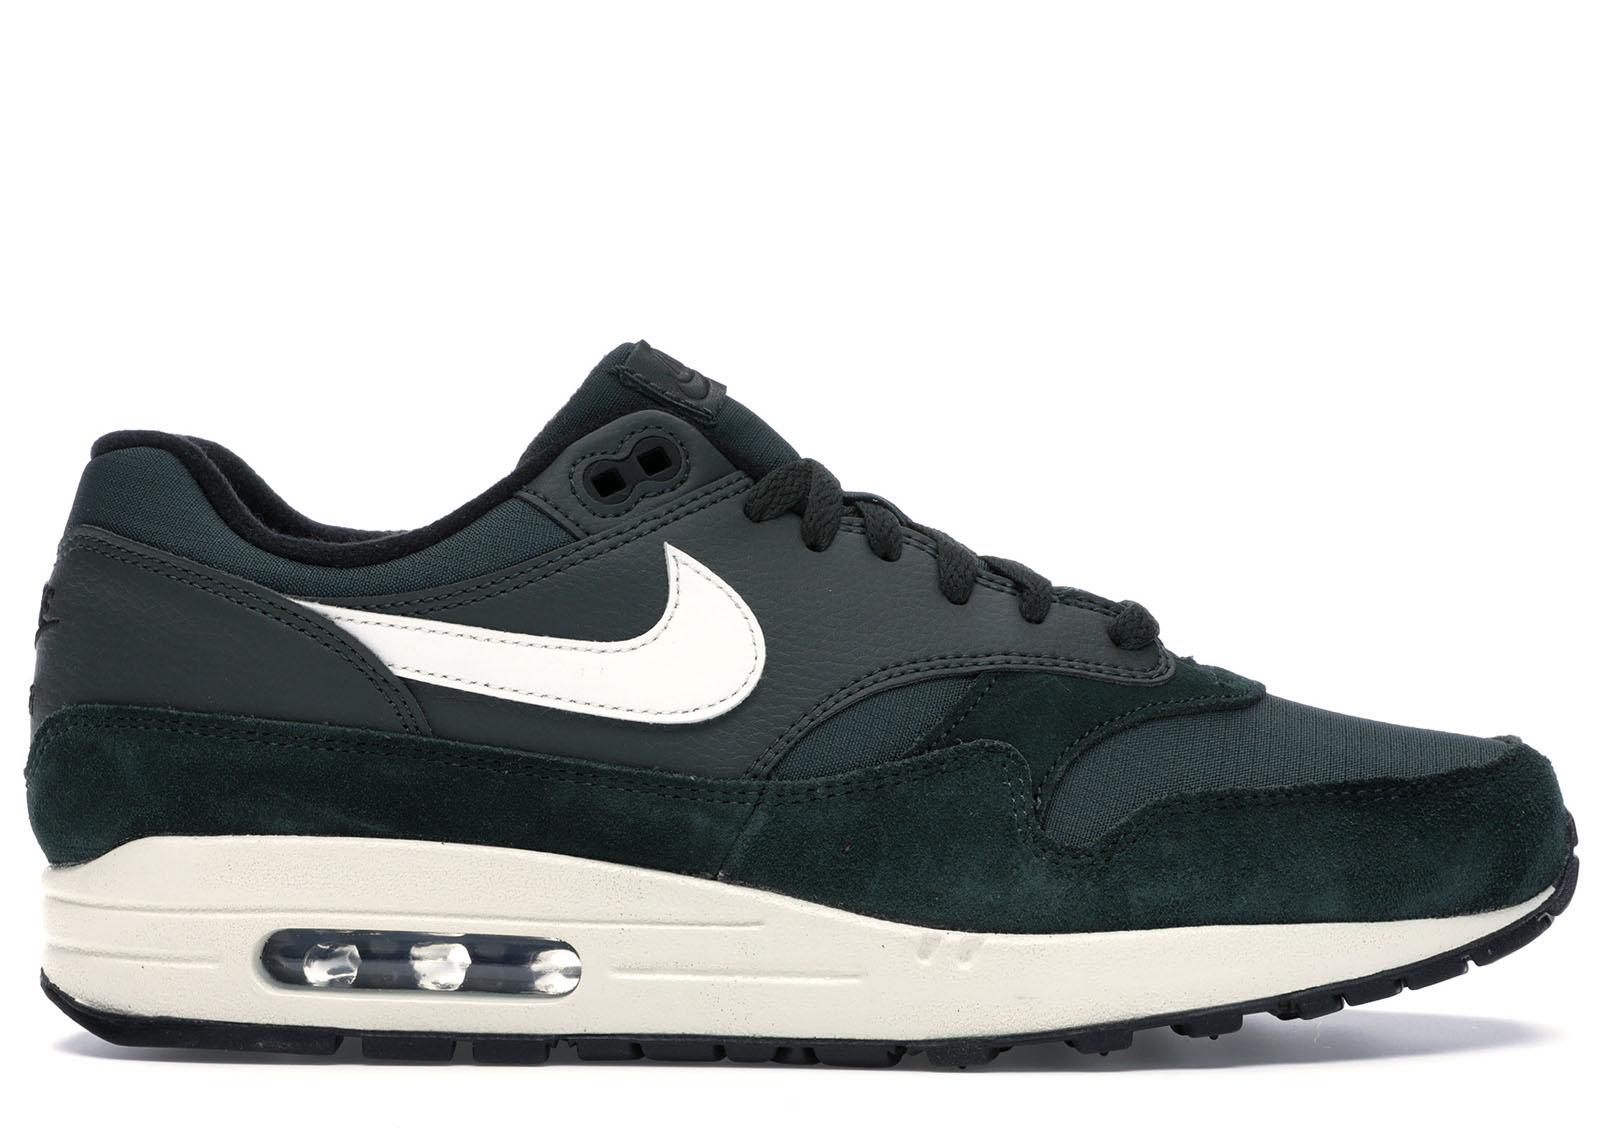 Nike Air Max 1 Outdoor Green - AH8145-303